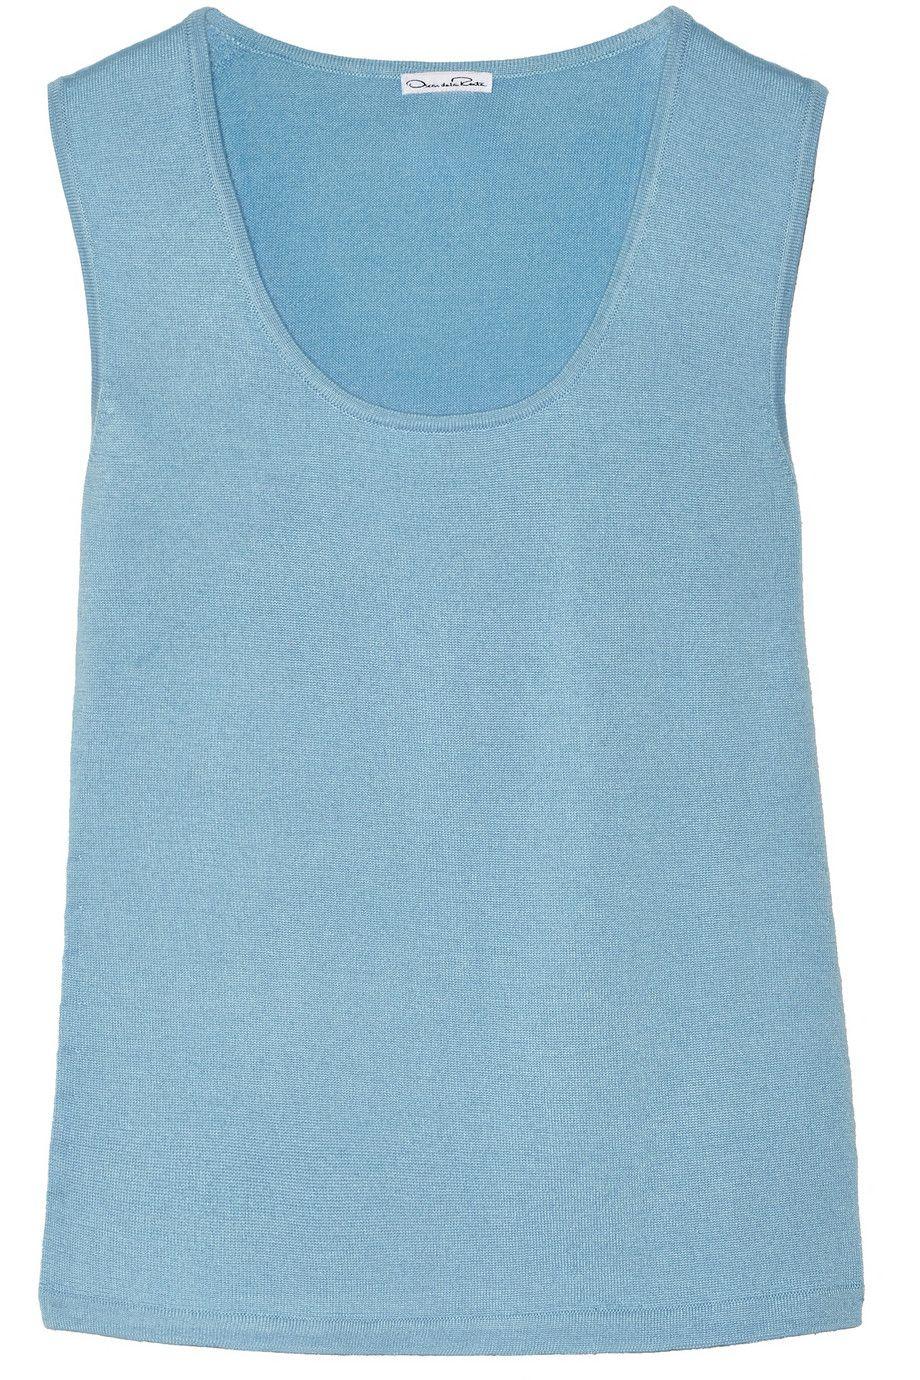 OSCAR DE LA RENTA Cashmere And Silk-Blend Top. #oscardelarenta #cloth #top